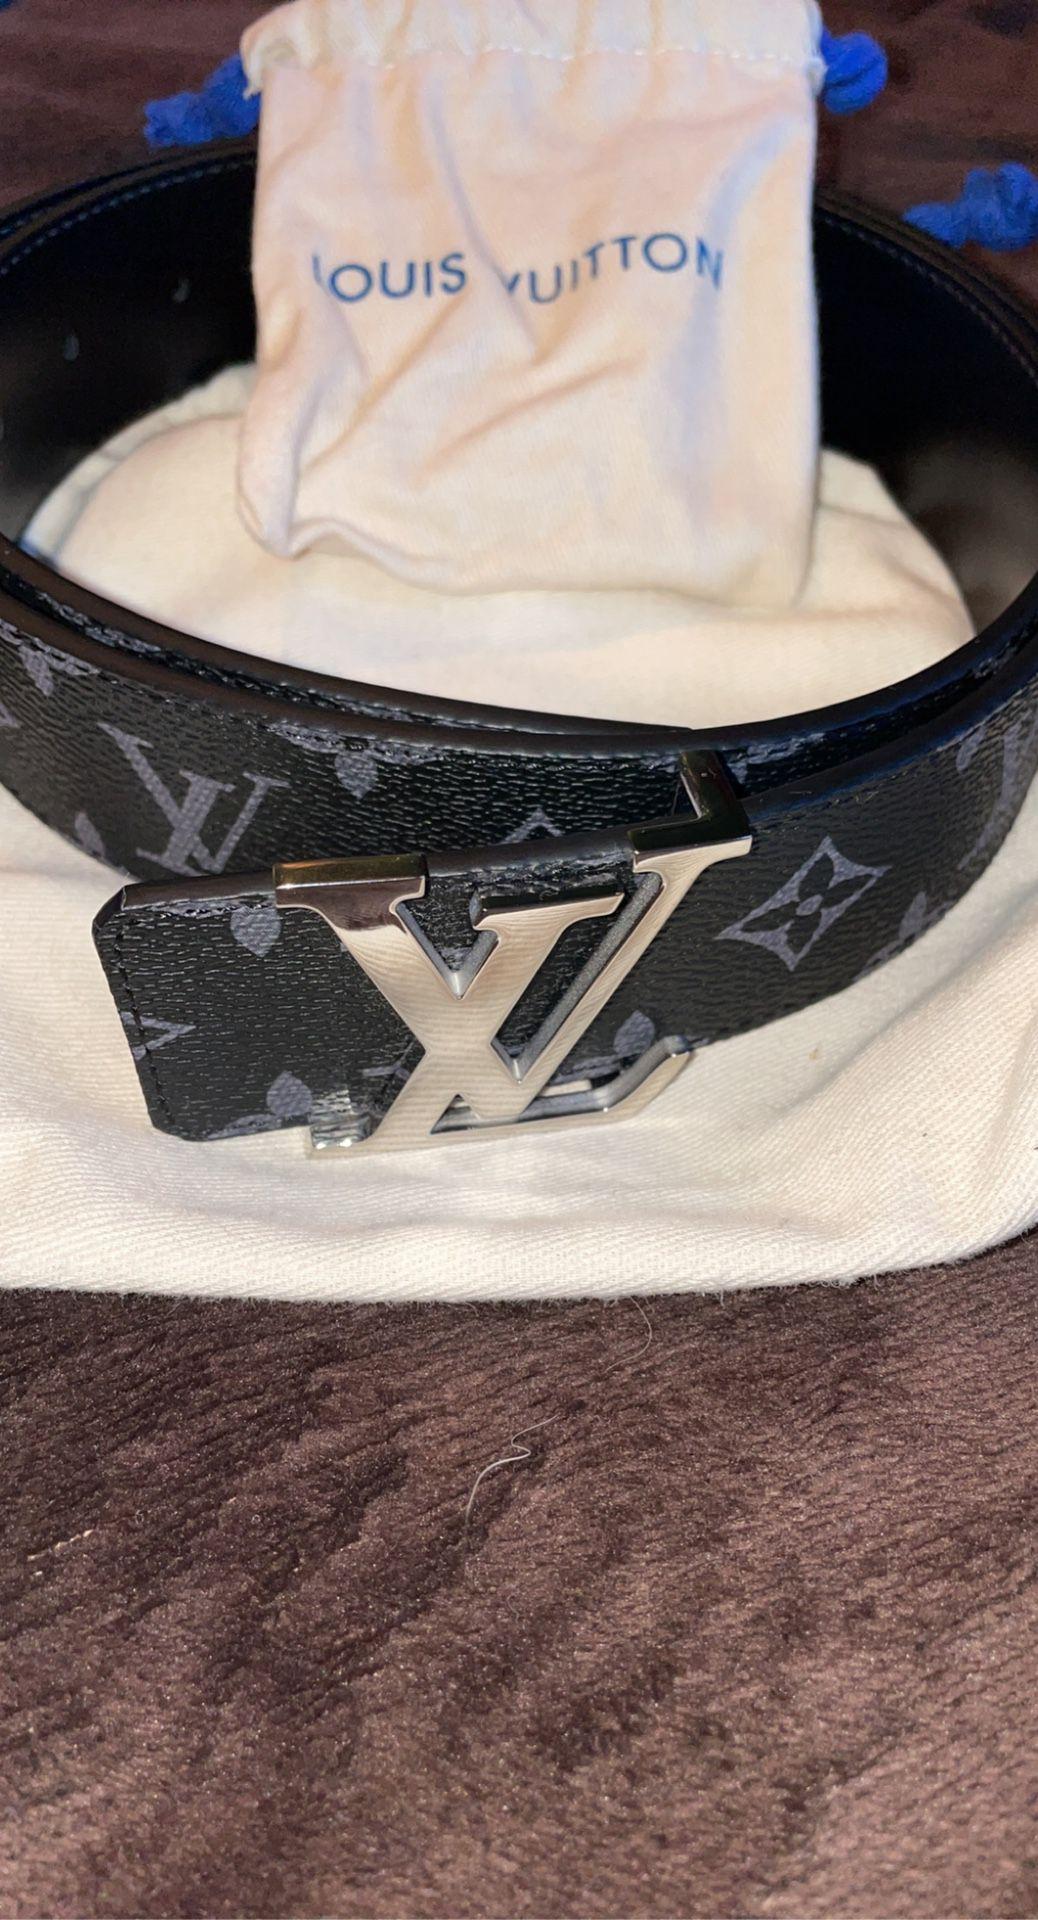 Louis Vuitton X Supreme Belt